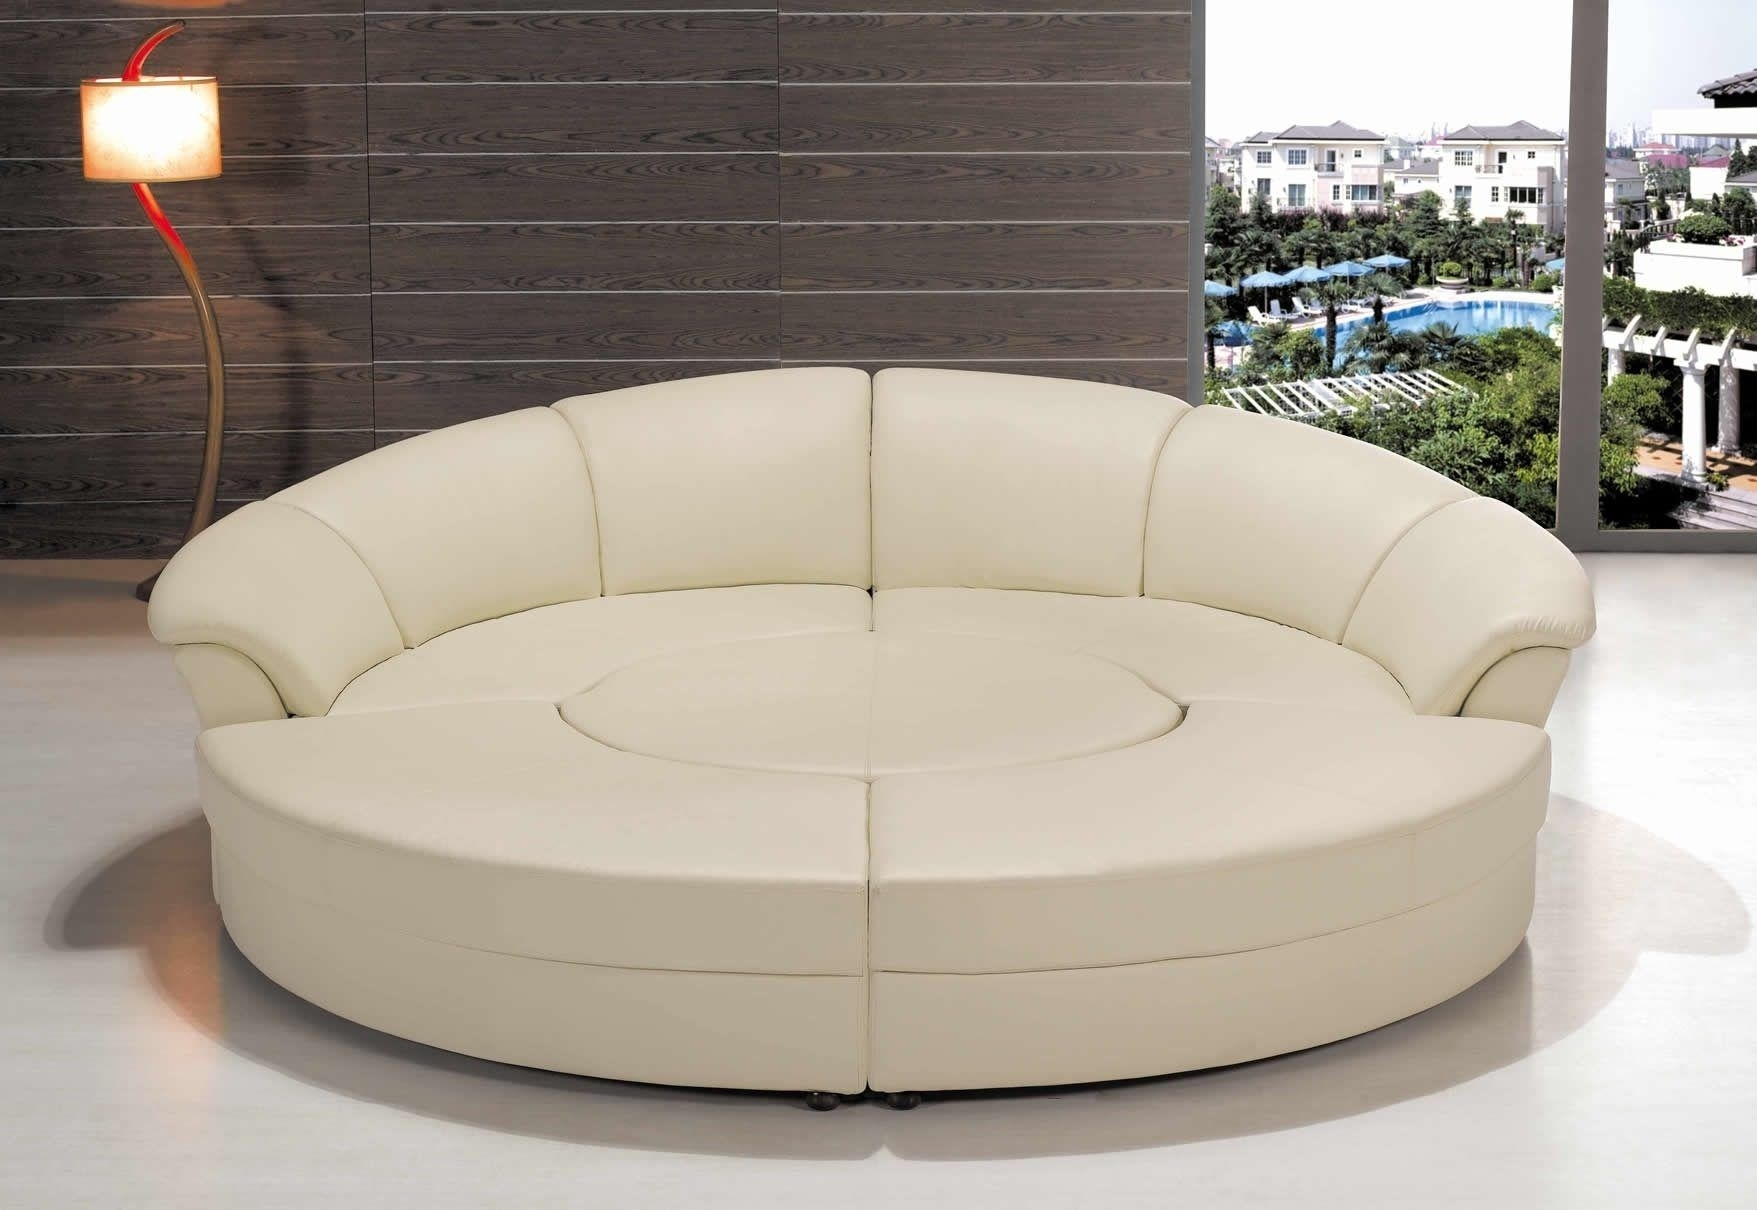 Semi Circular Sectional Sofa 2 – Semi Circular Sofa Uk, Sofa | Stuff Throughout Semicircular Sofas (View 9 of 10)